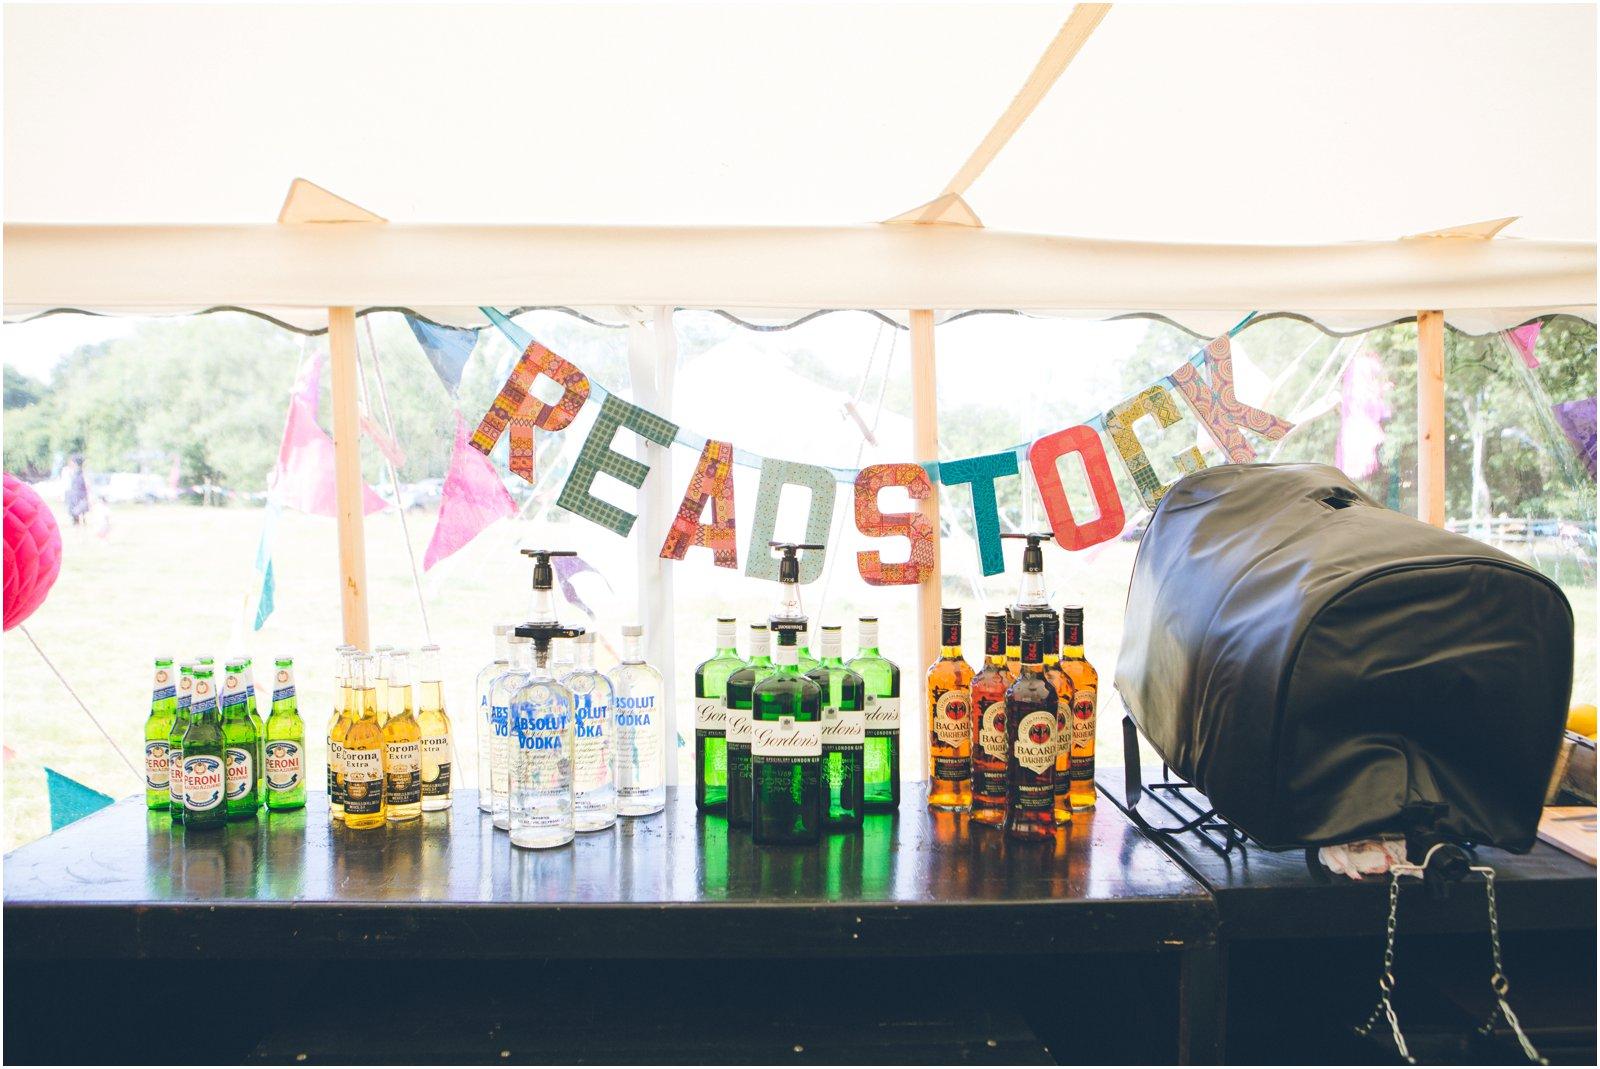 Sally and Damien's wedding festival by Summertown Pictures-23_DerrynSchmidt